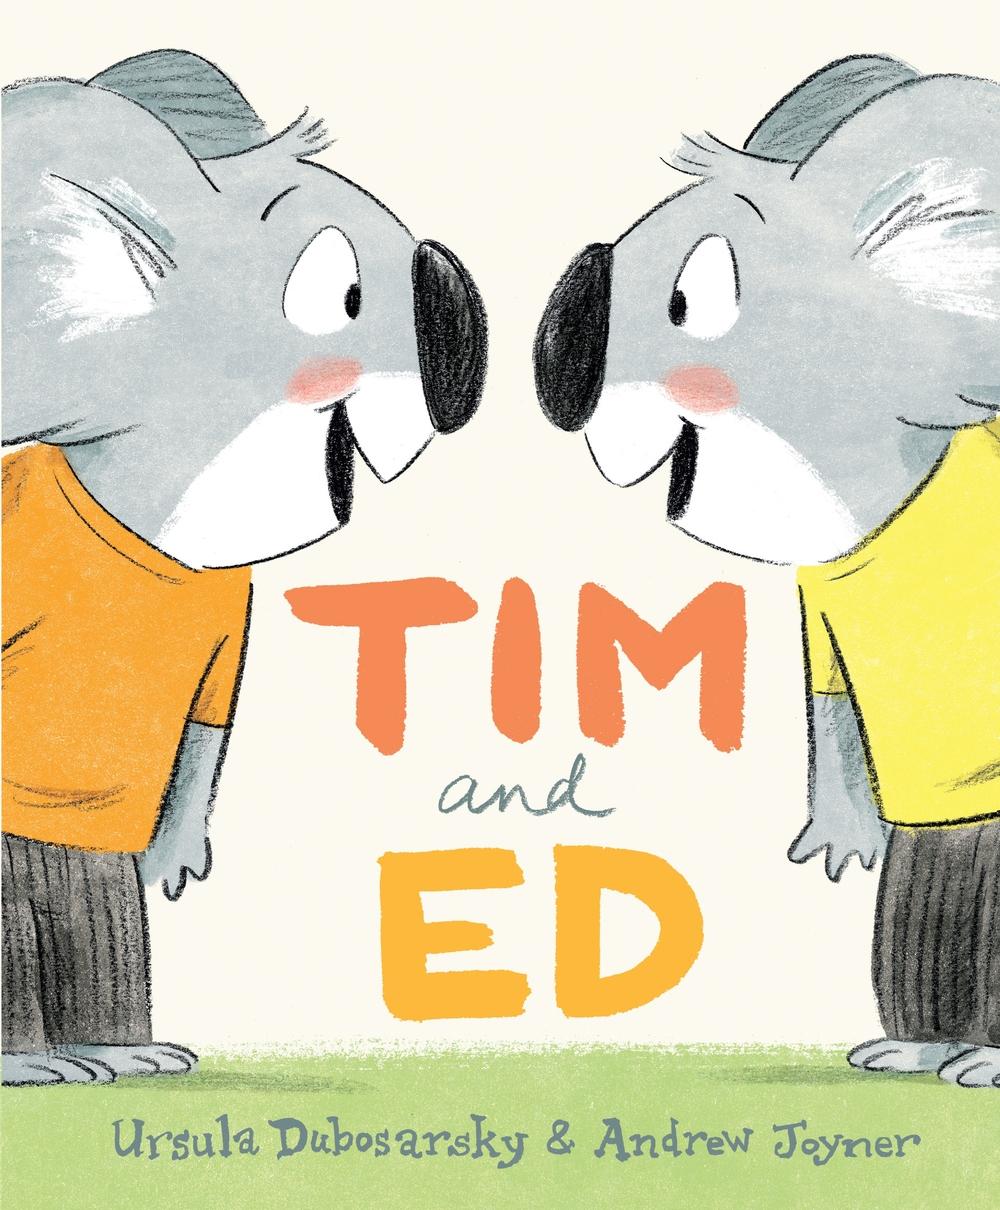 tim and ed cover hi res.jpg